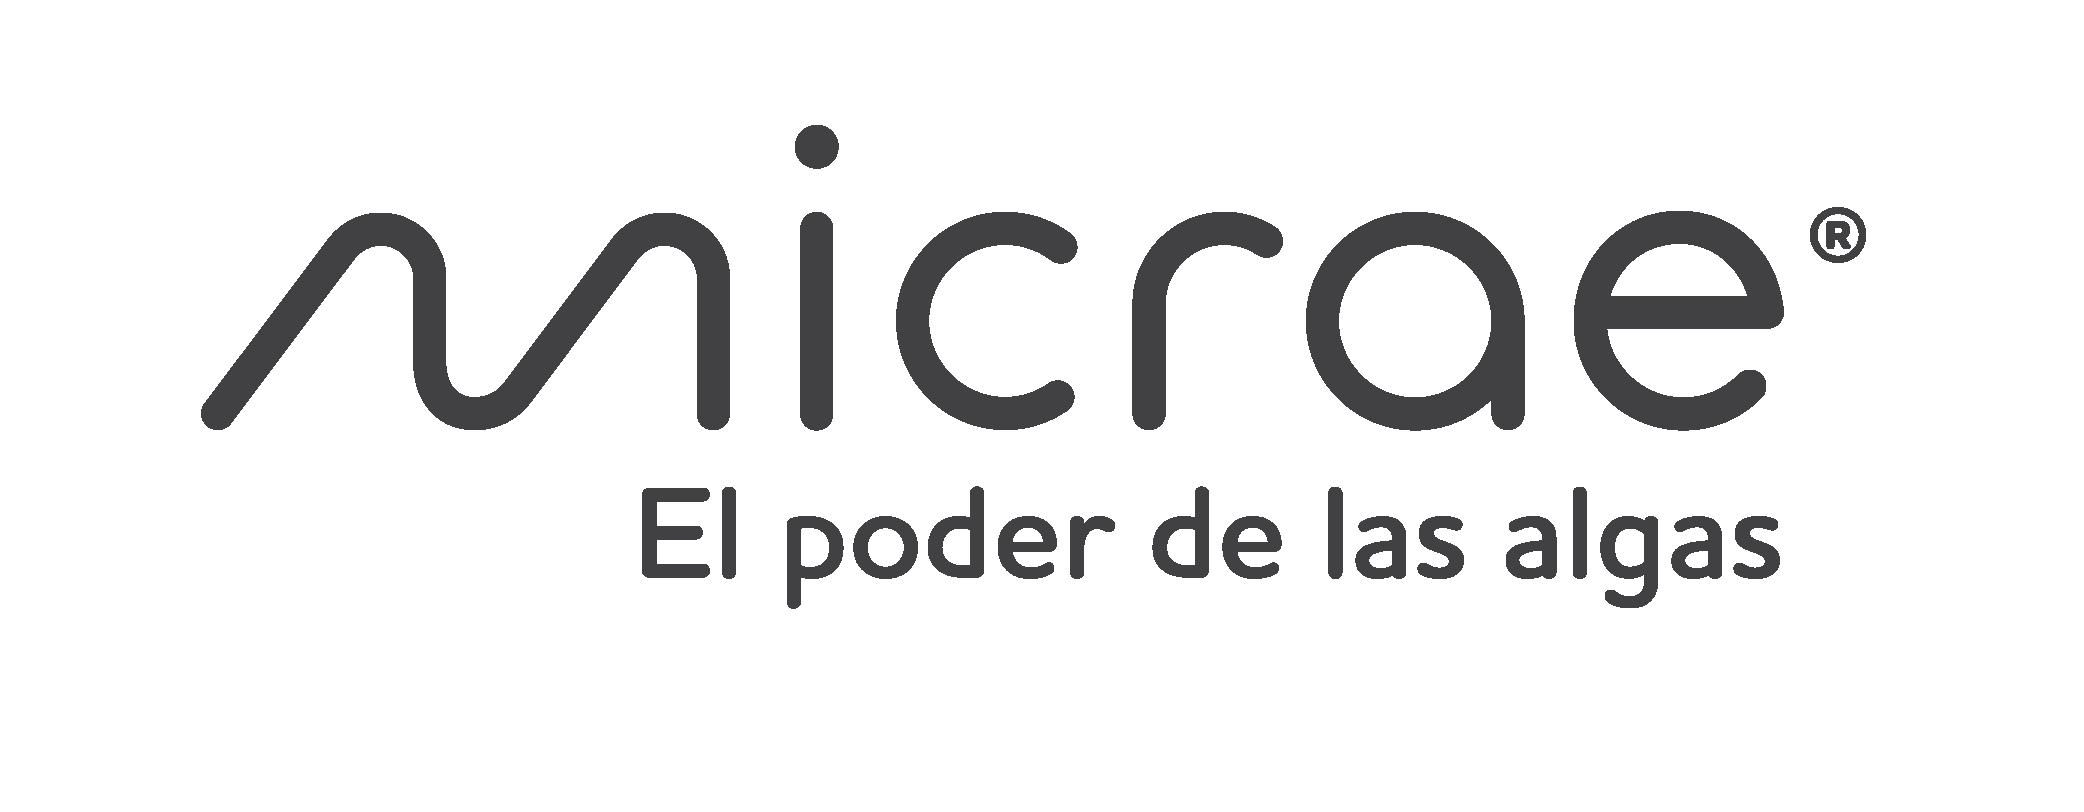 Micrae_bajada_Negro_sin fondo.png